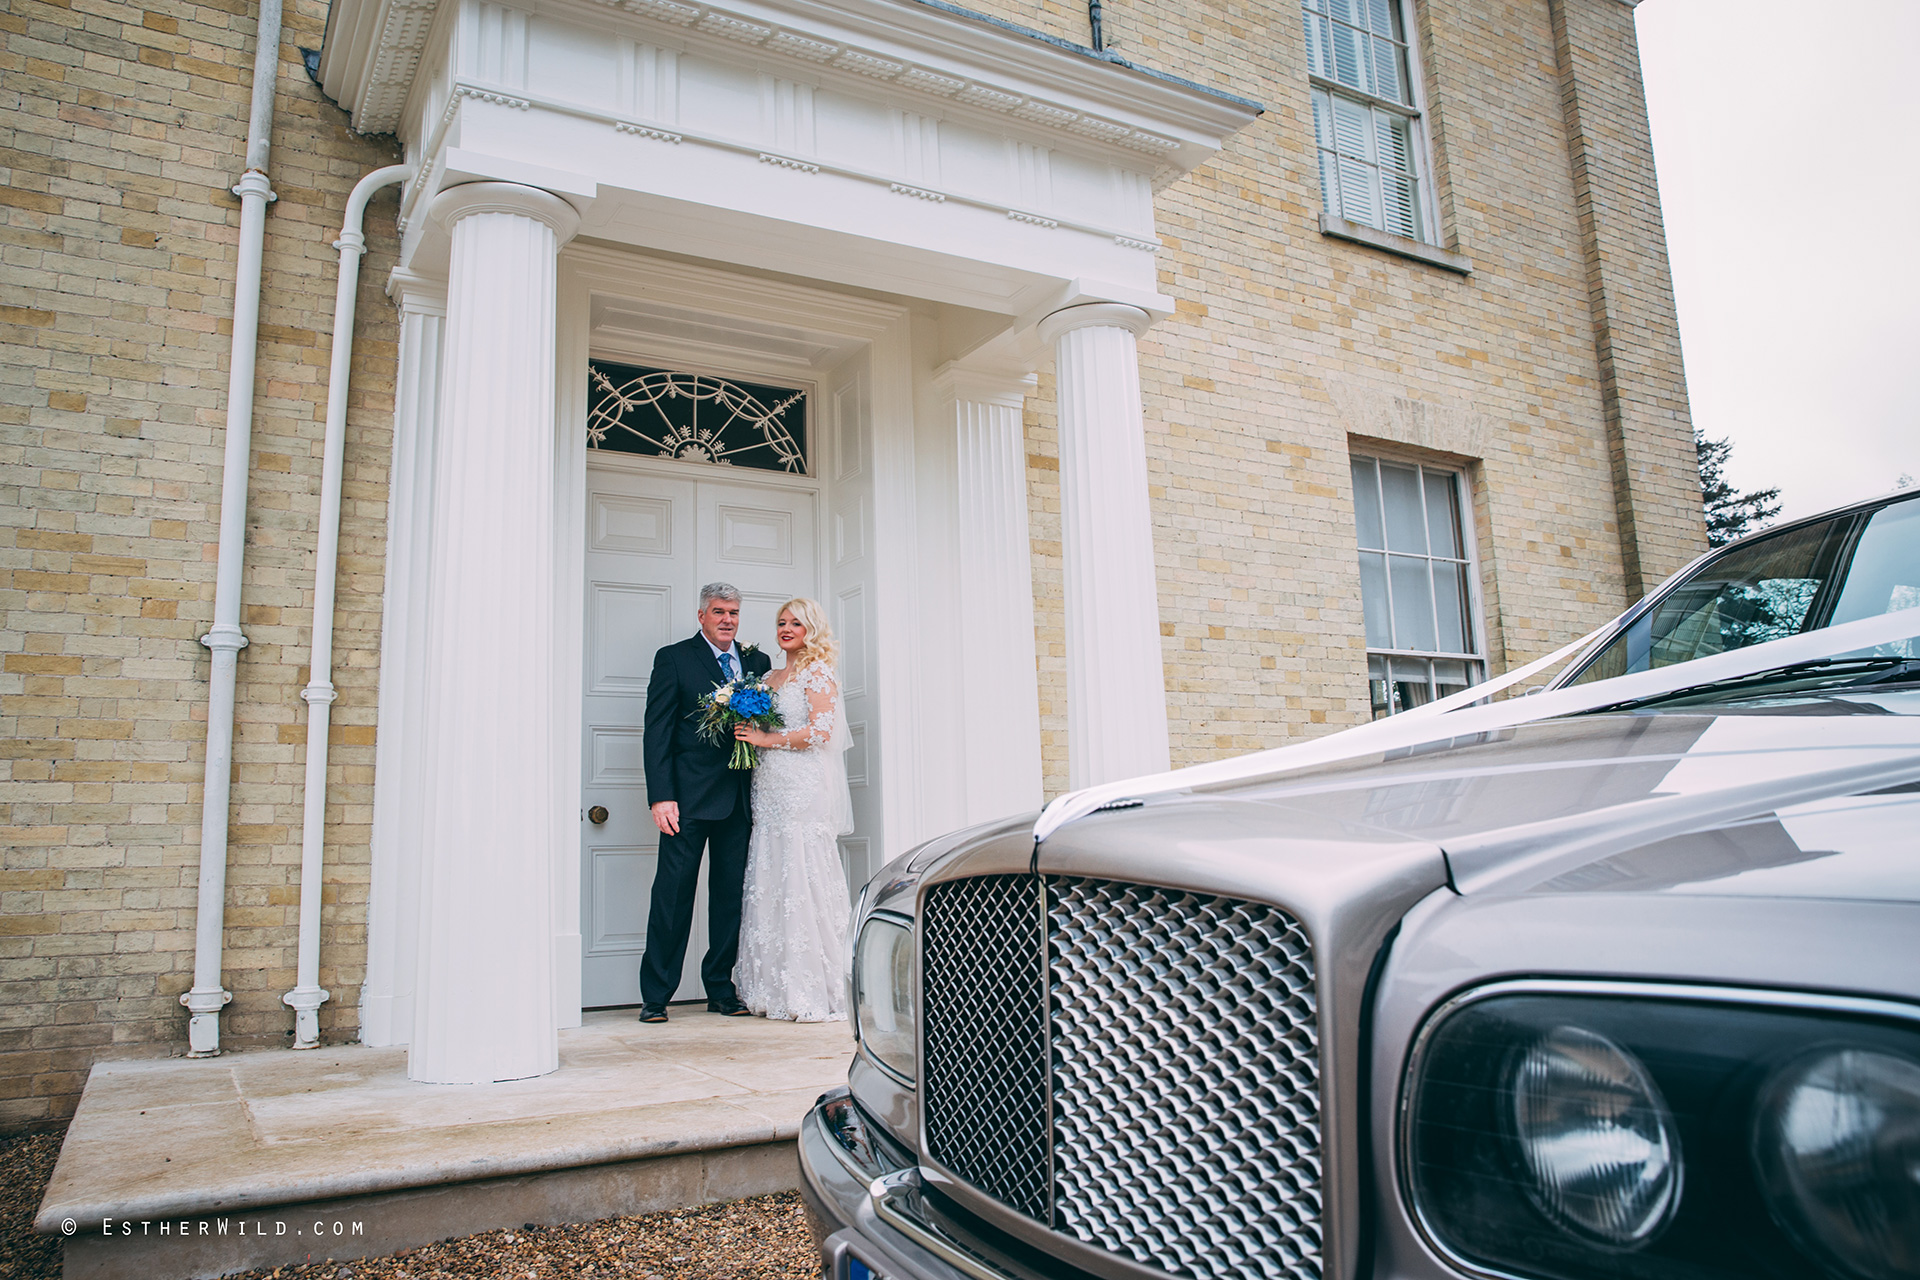 Wedding_Photographer_Norfolk_photography_Esther_Wild (59).jpg